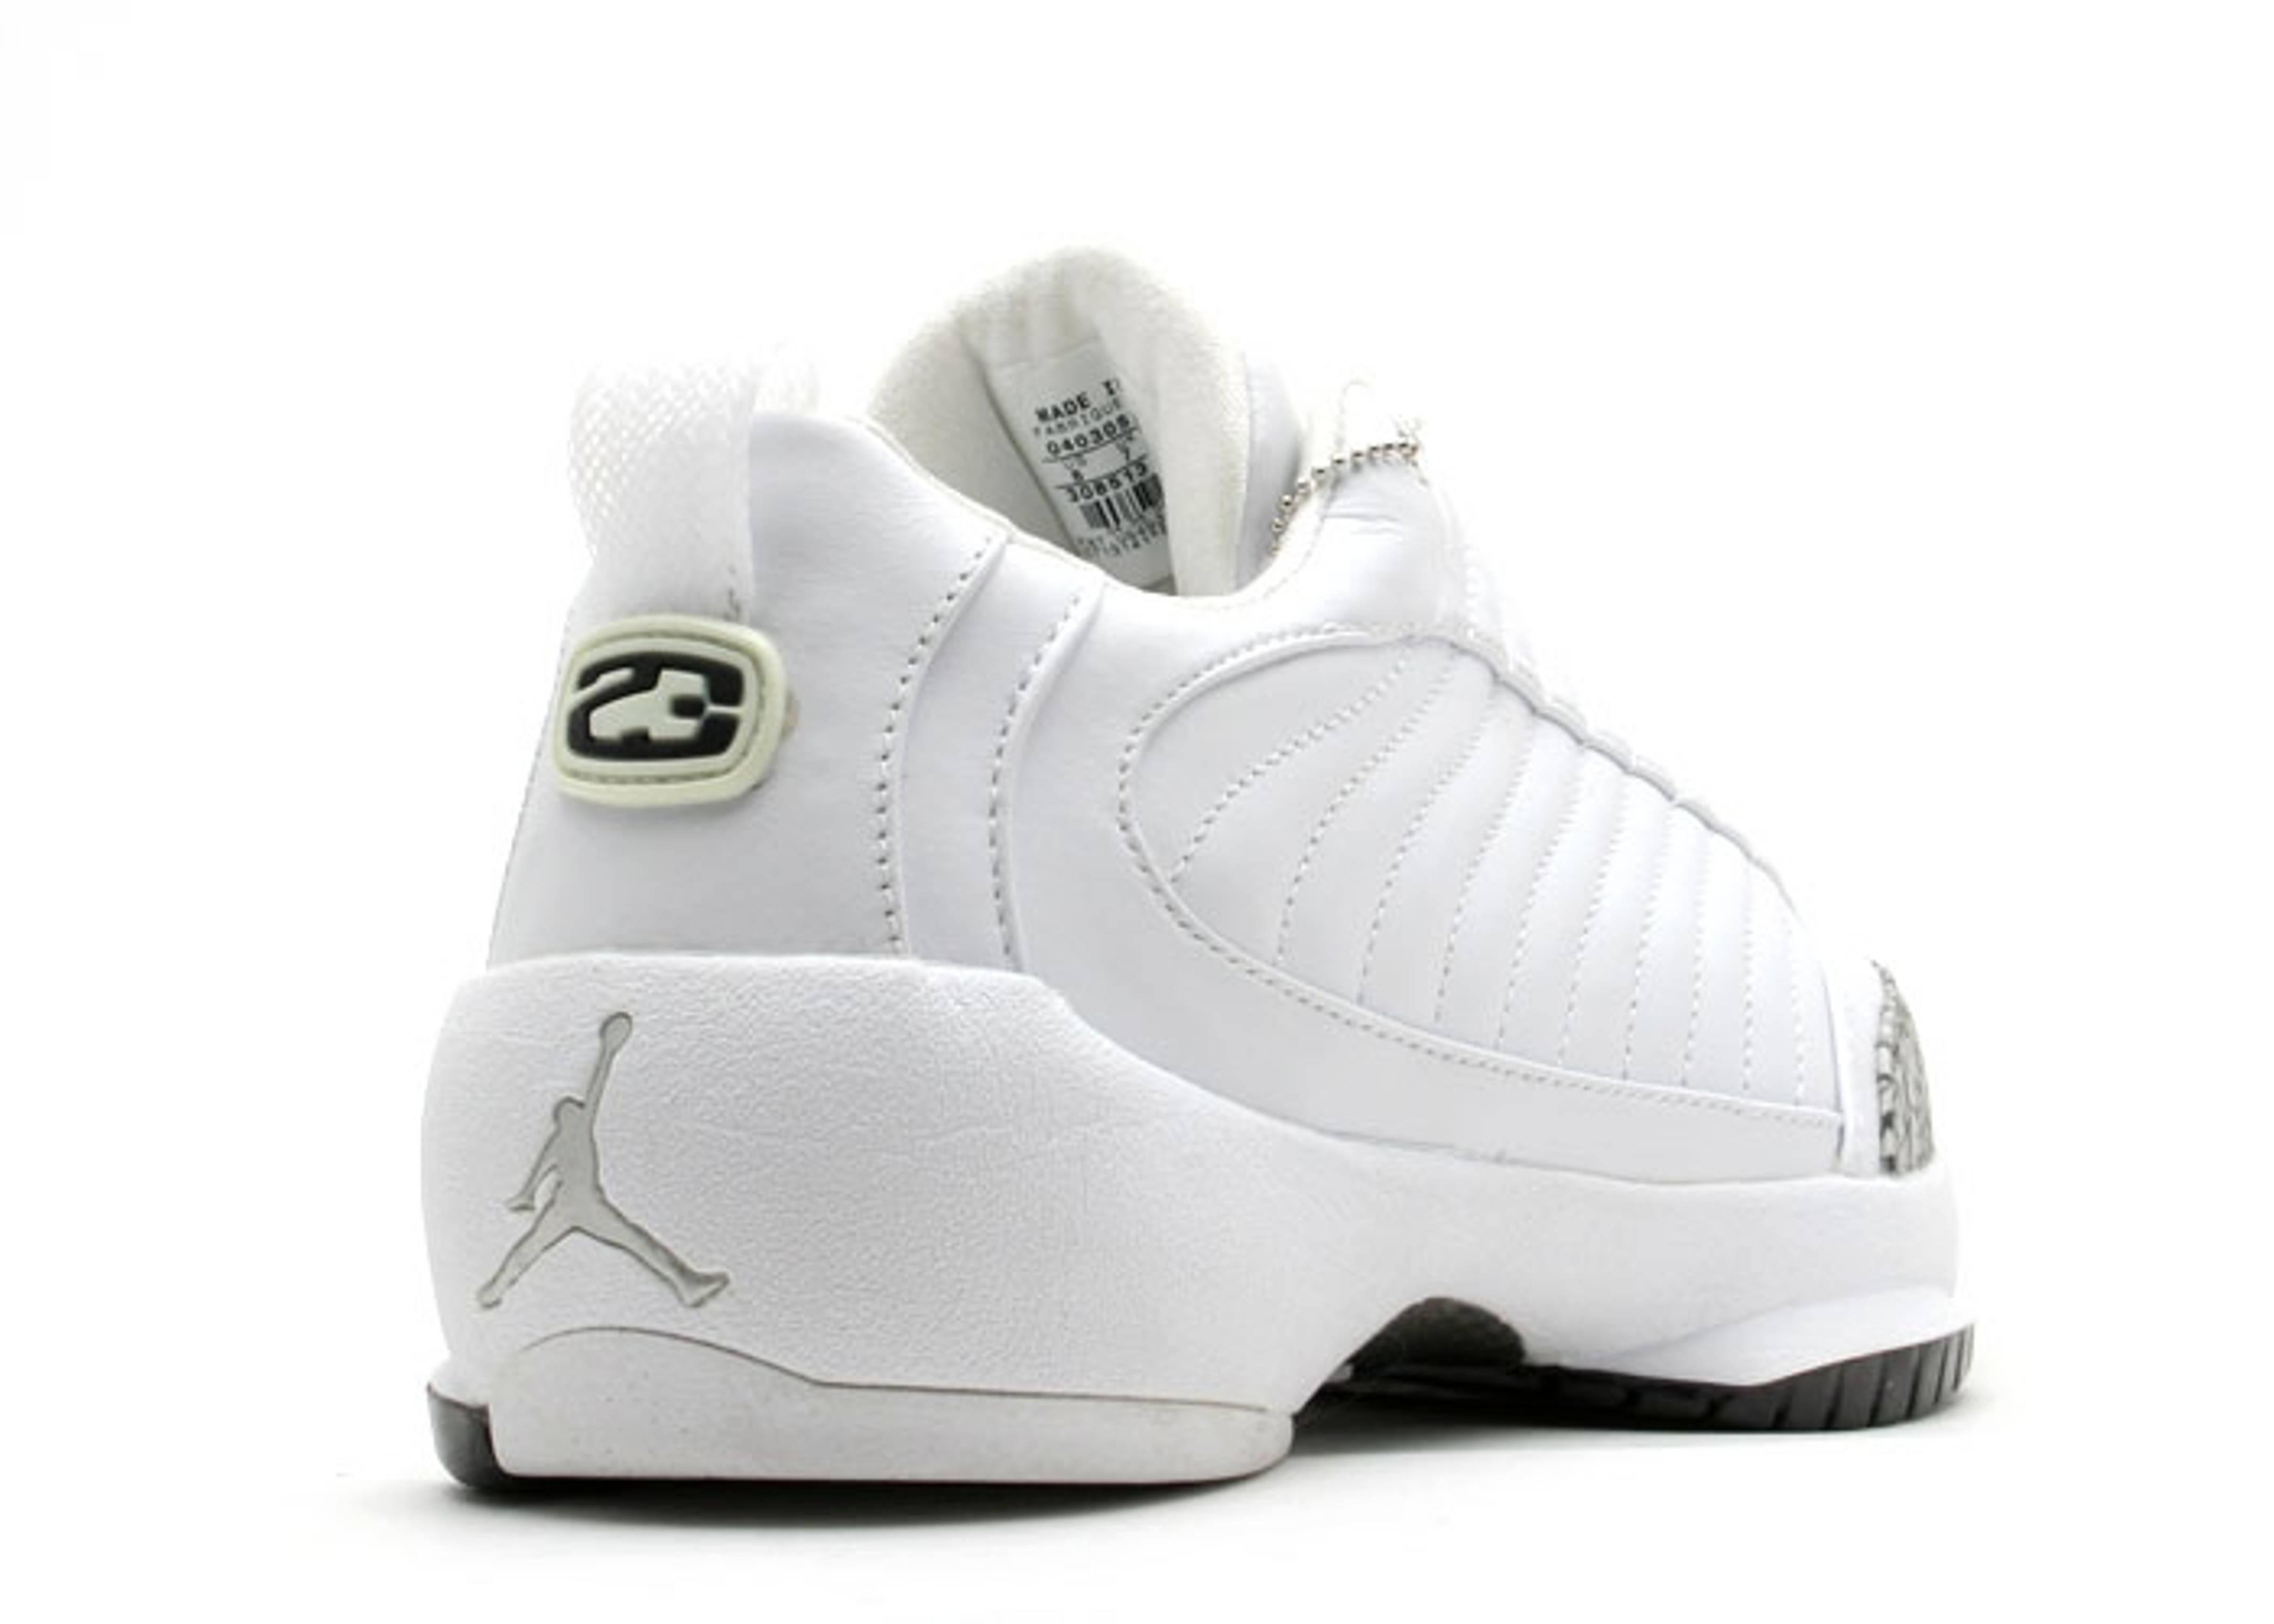 228af3583cdd Air Jordan 19 Low - Air Jordan - 308513 111 - white white-black ...